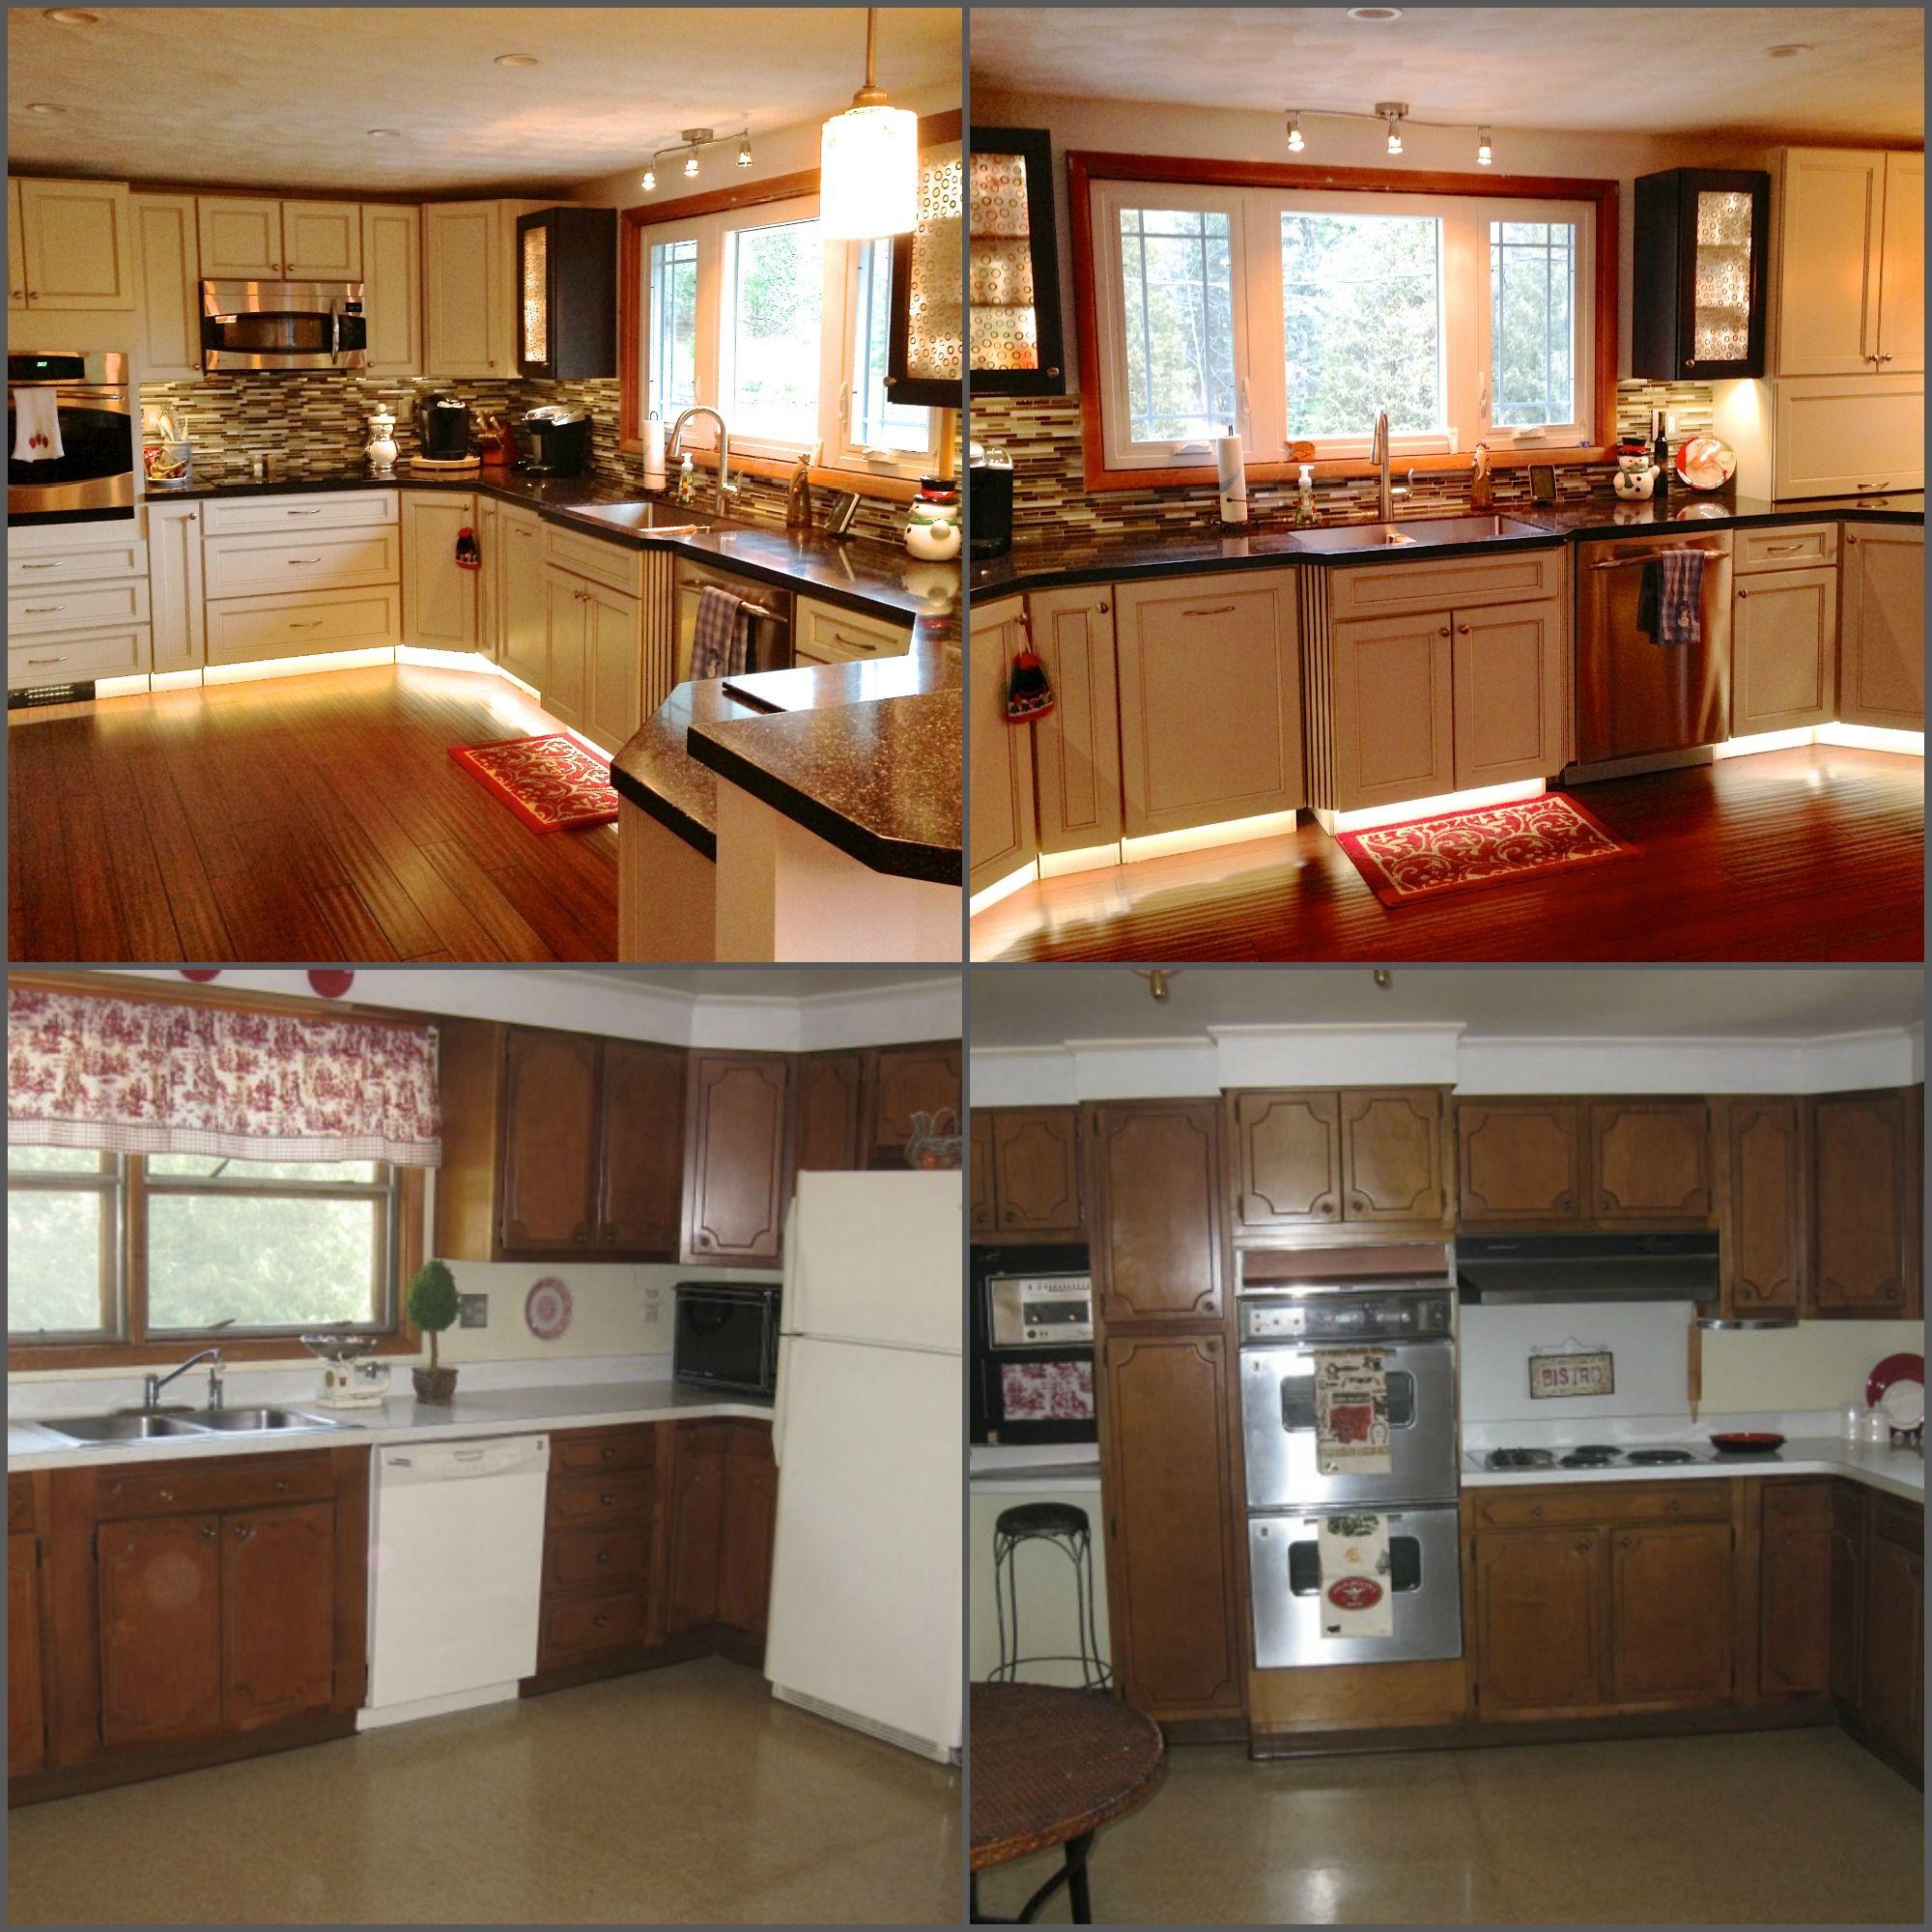 kitchen cabinets remodel breakfast bar mobile home remodeling ideas pinterest